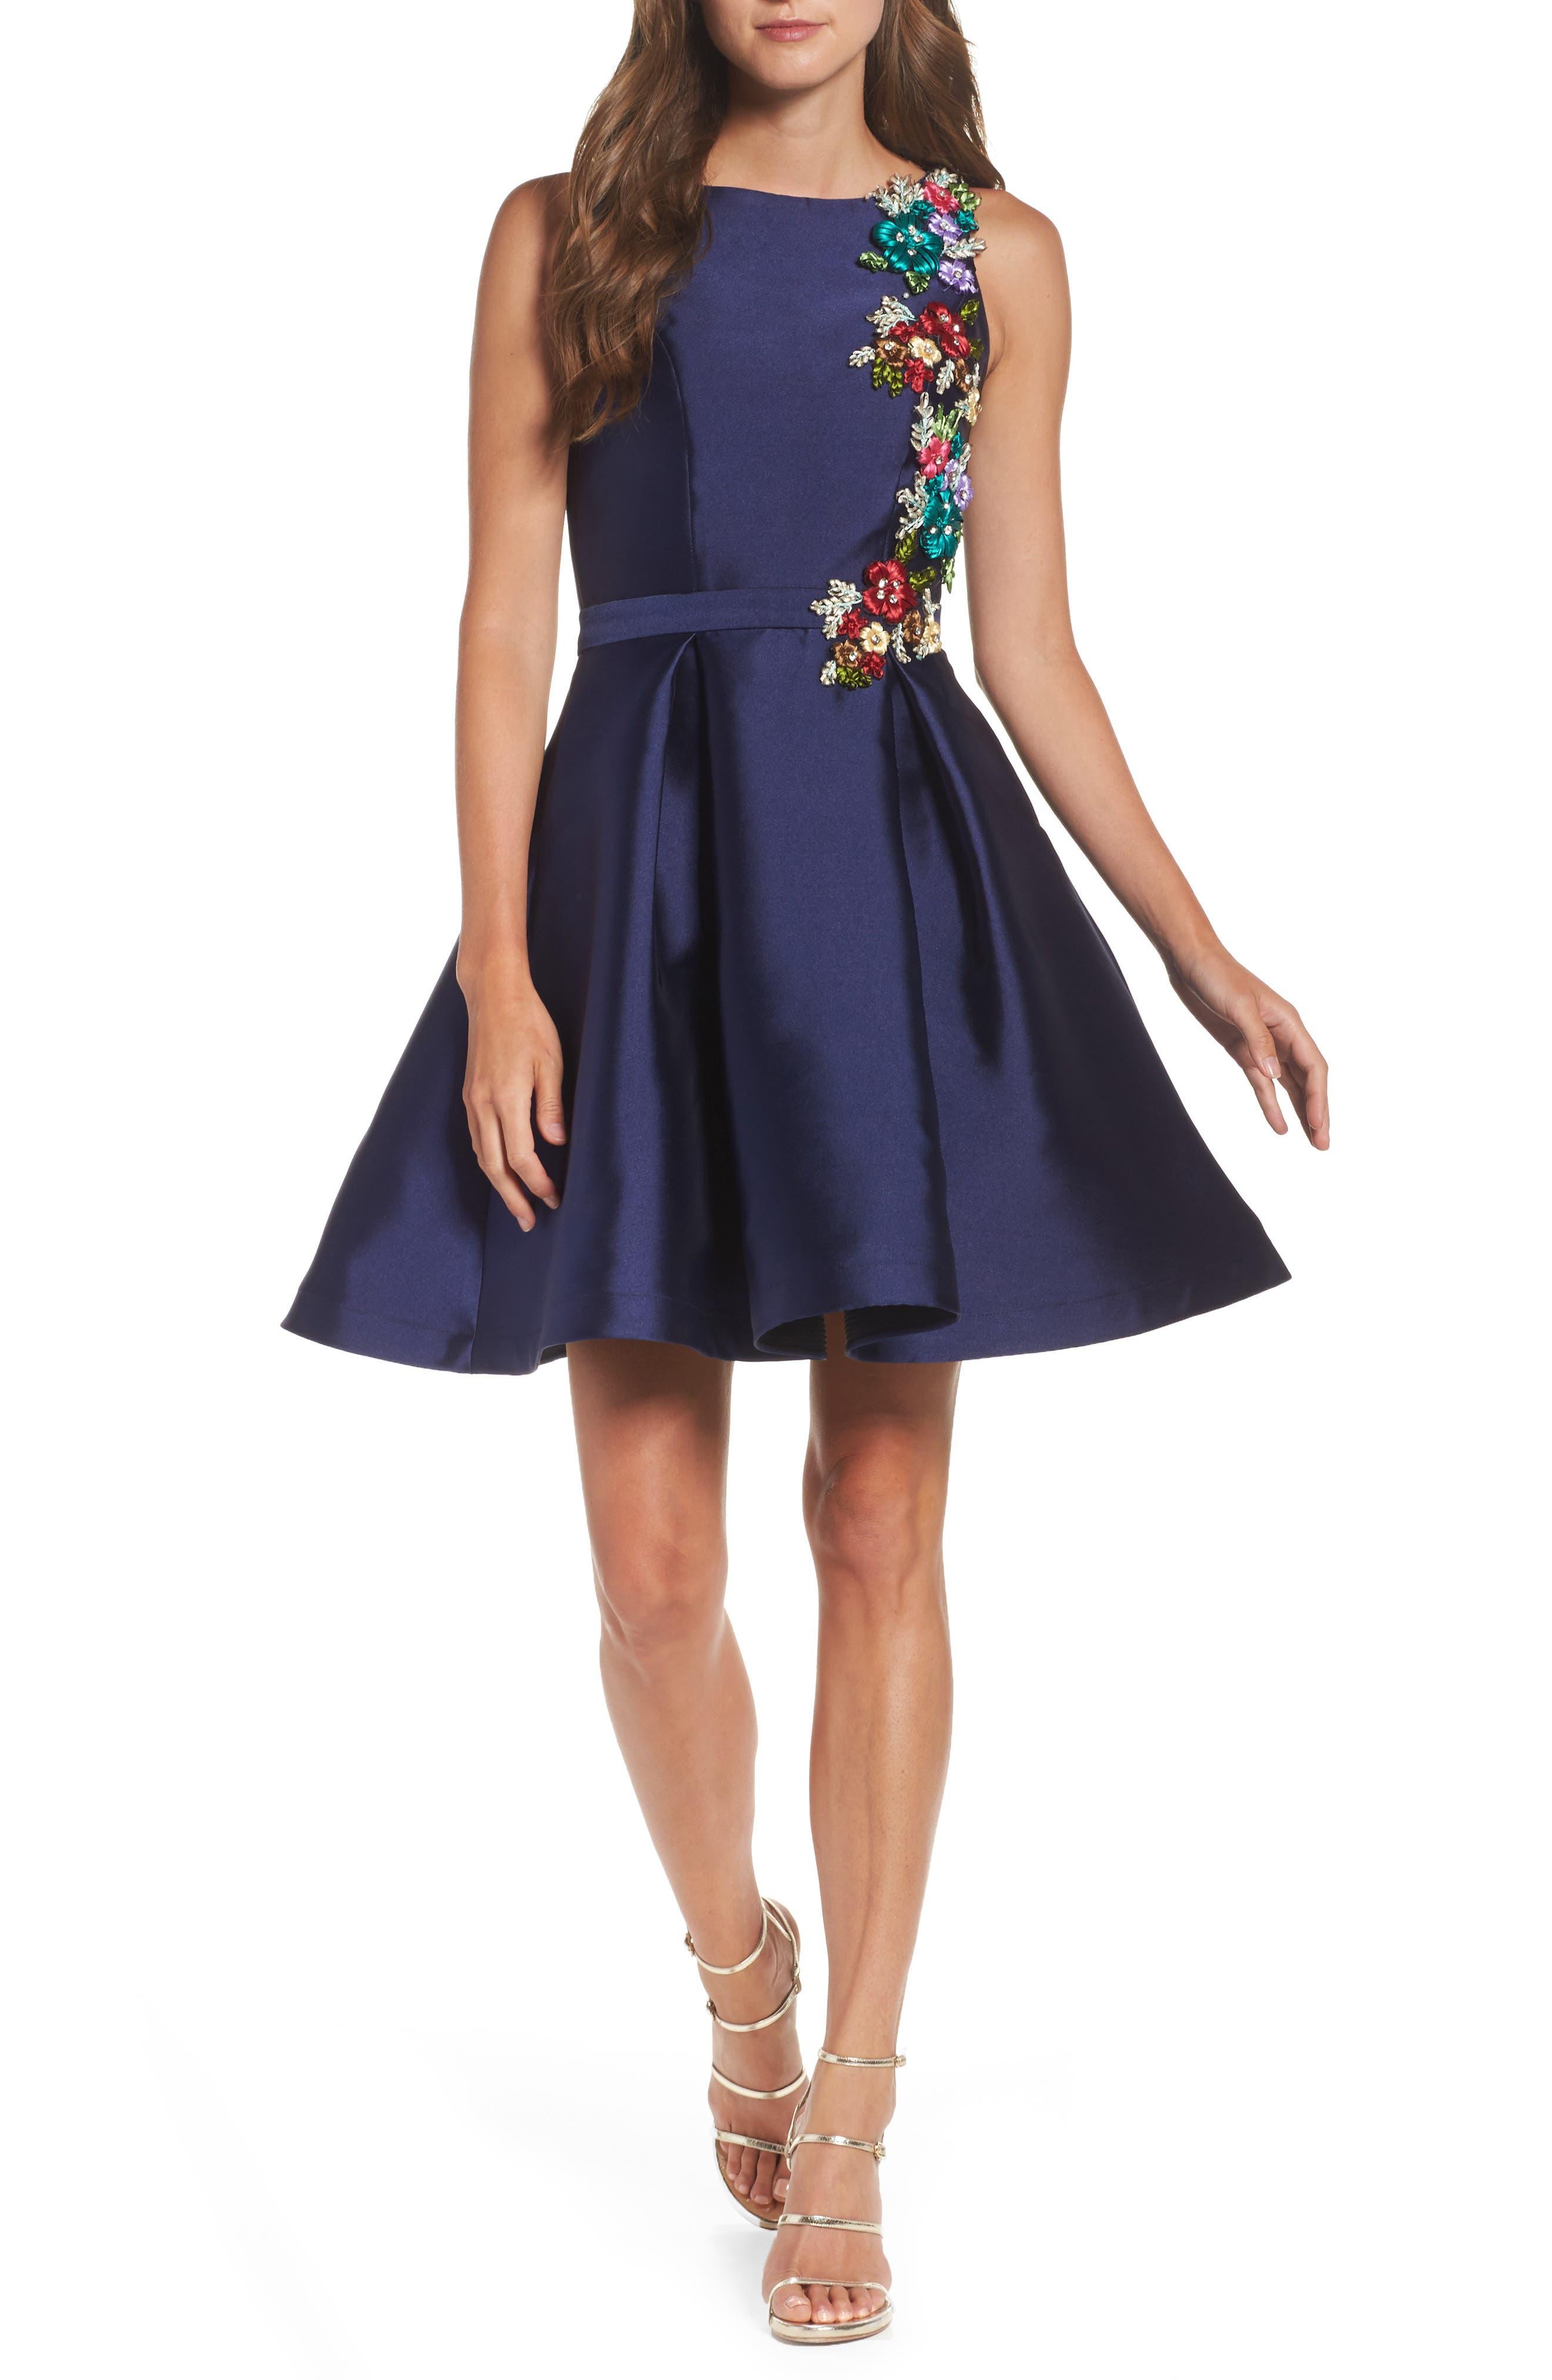 Micado Floral Appliqué Fit & Flare Minidress,                         Main,                         color, MIDNIGHT